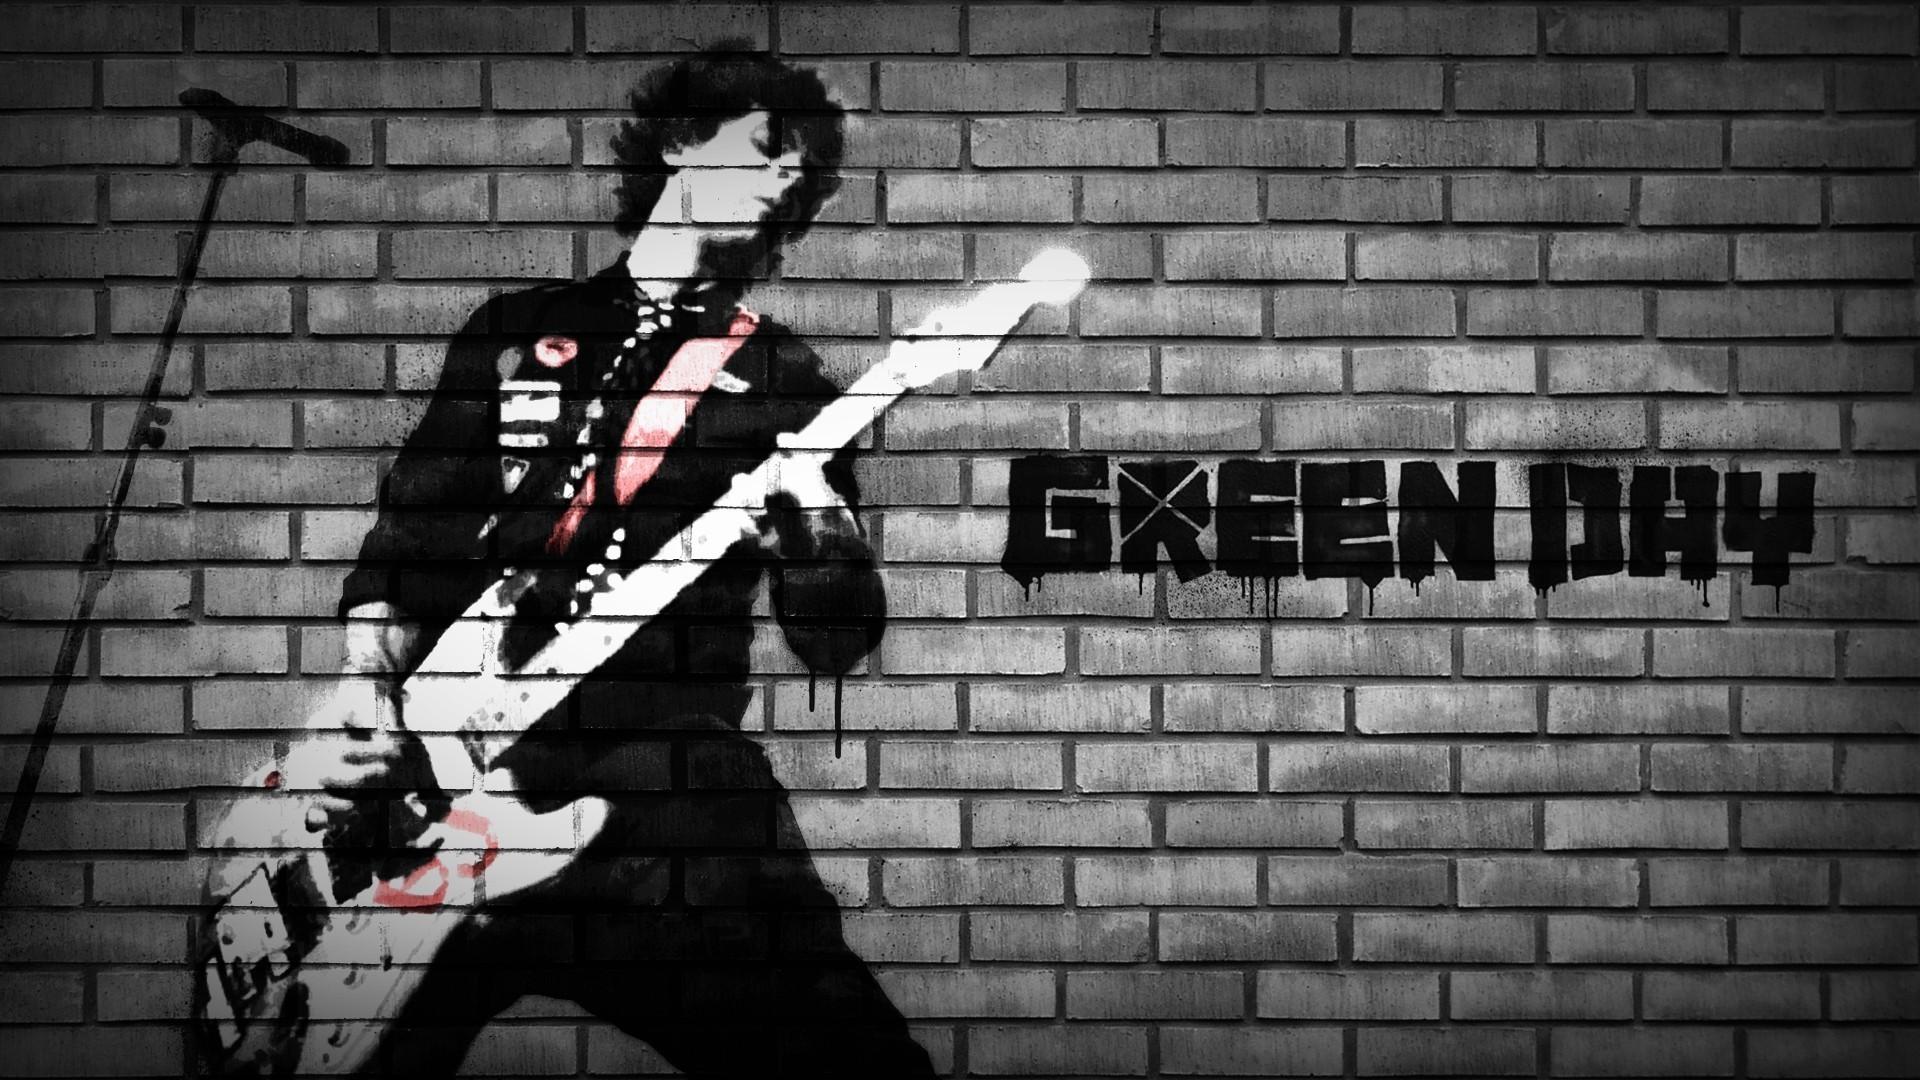 Green Day Wallpaper Desktop Size 1920x1080 18982 AmazingPictcom 1920x1080